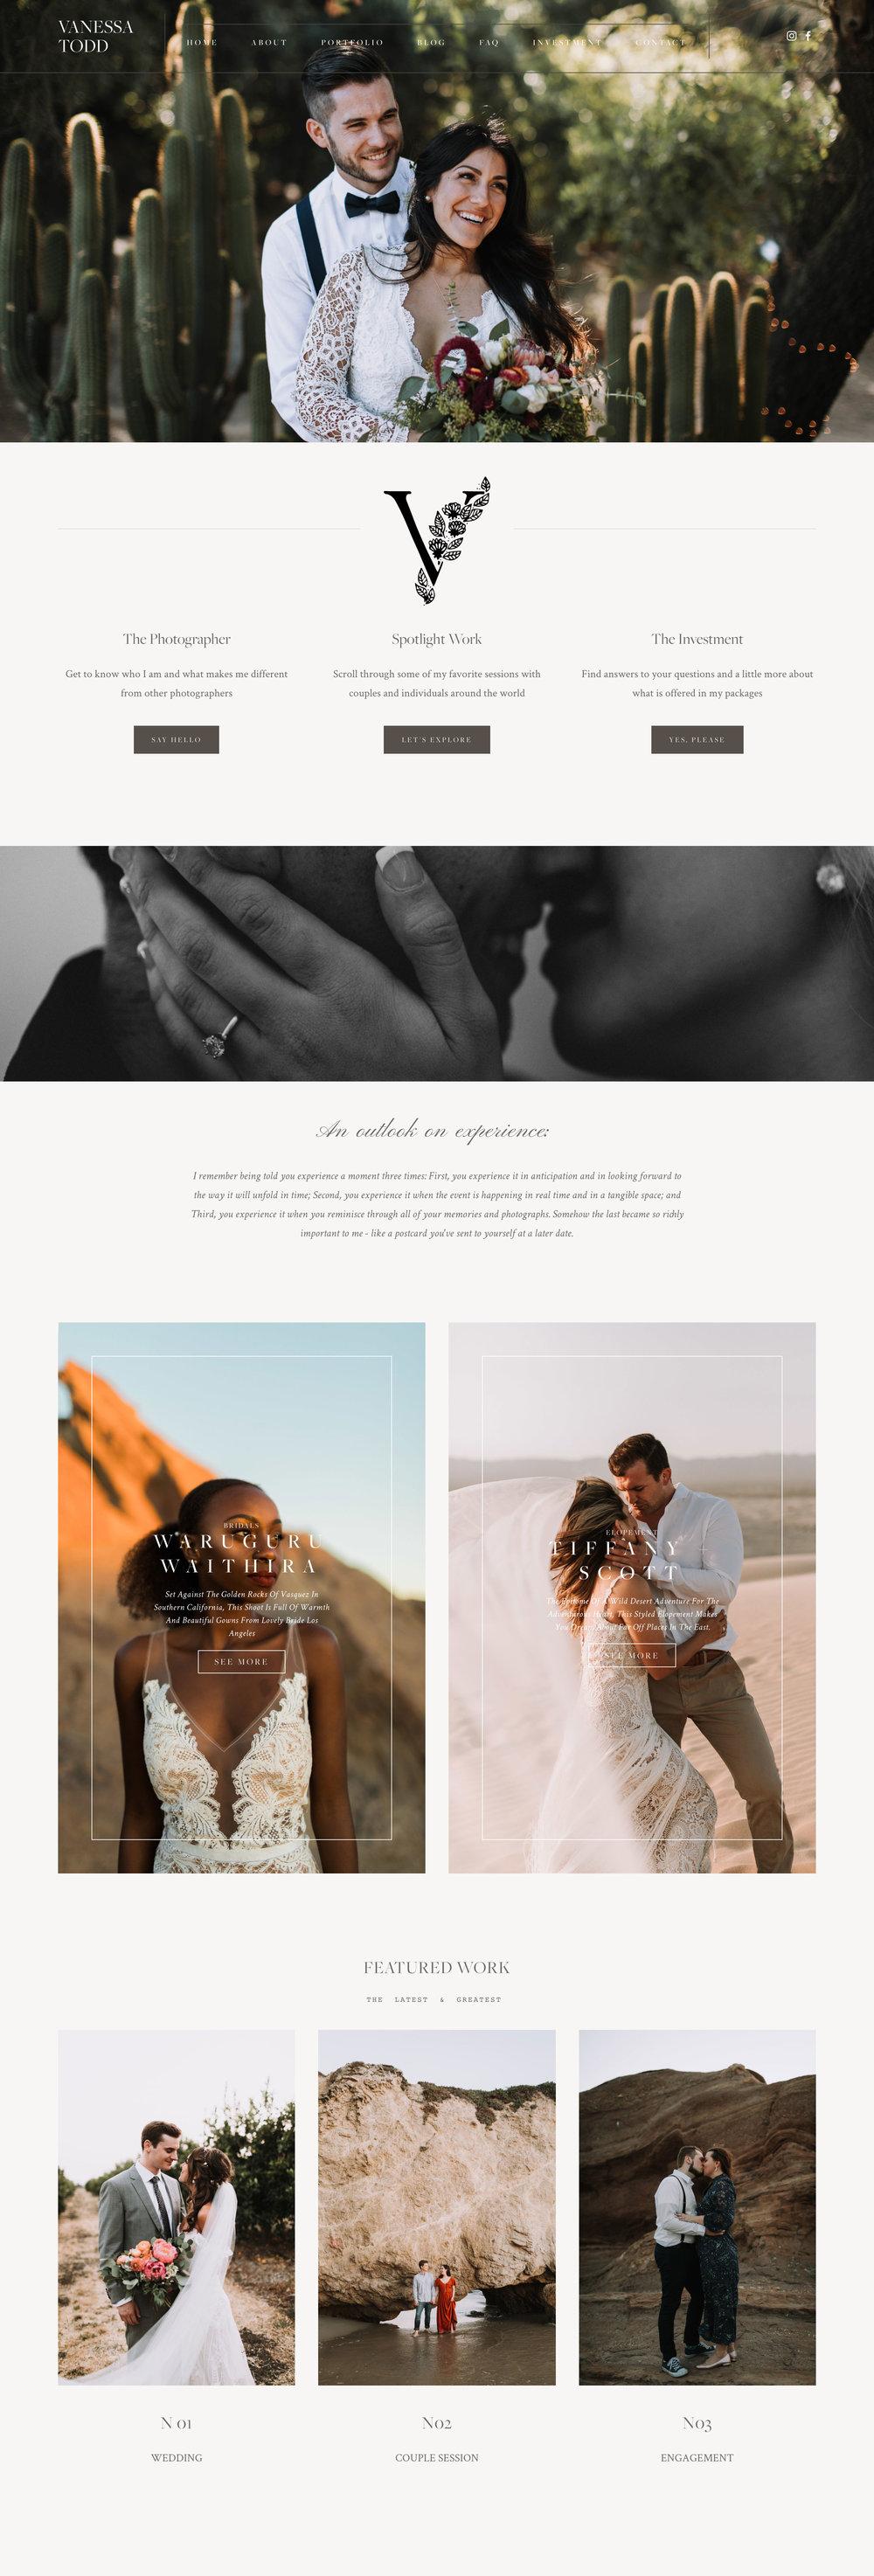 vanessatodd-website-design-photography.jpg